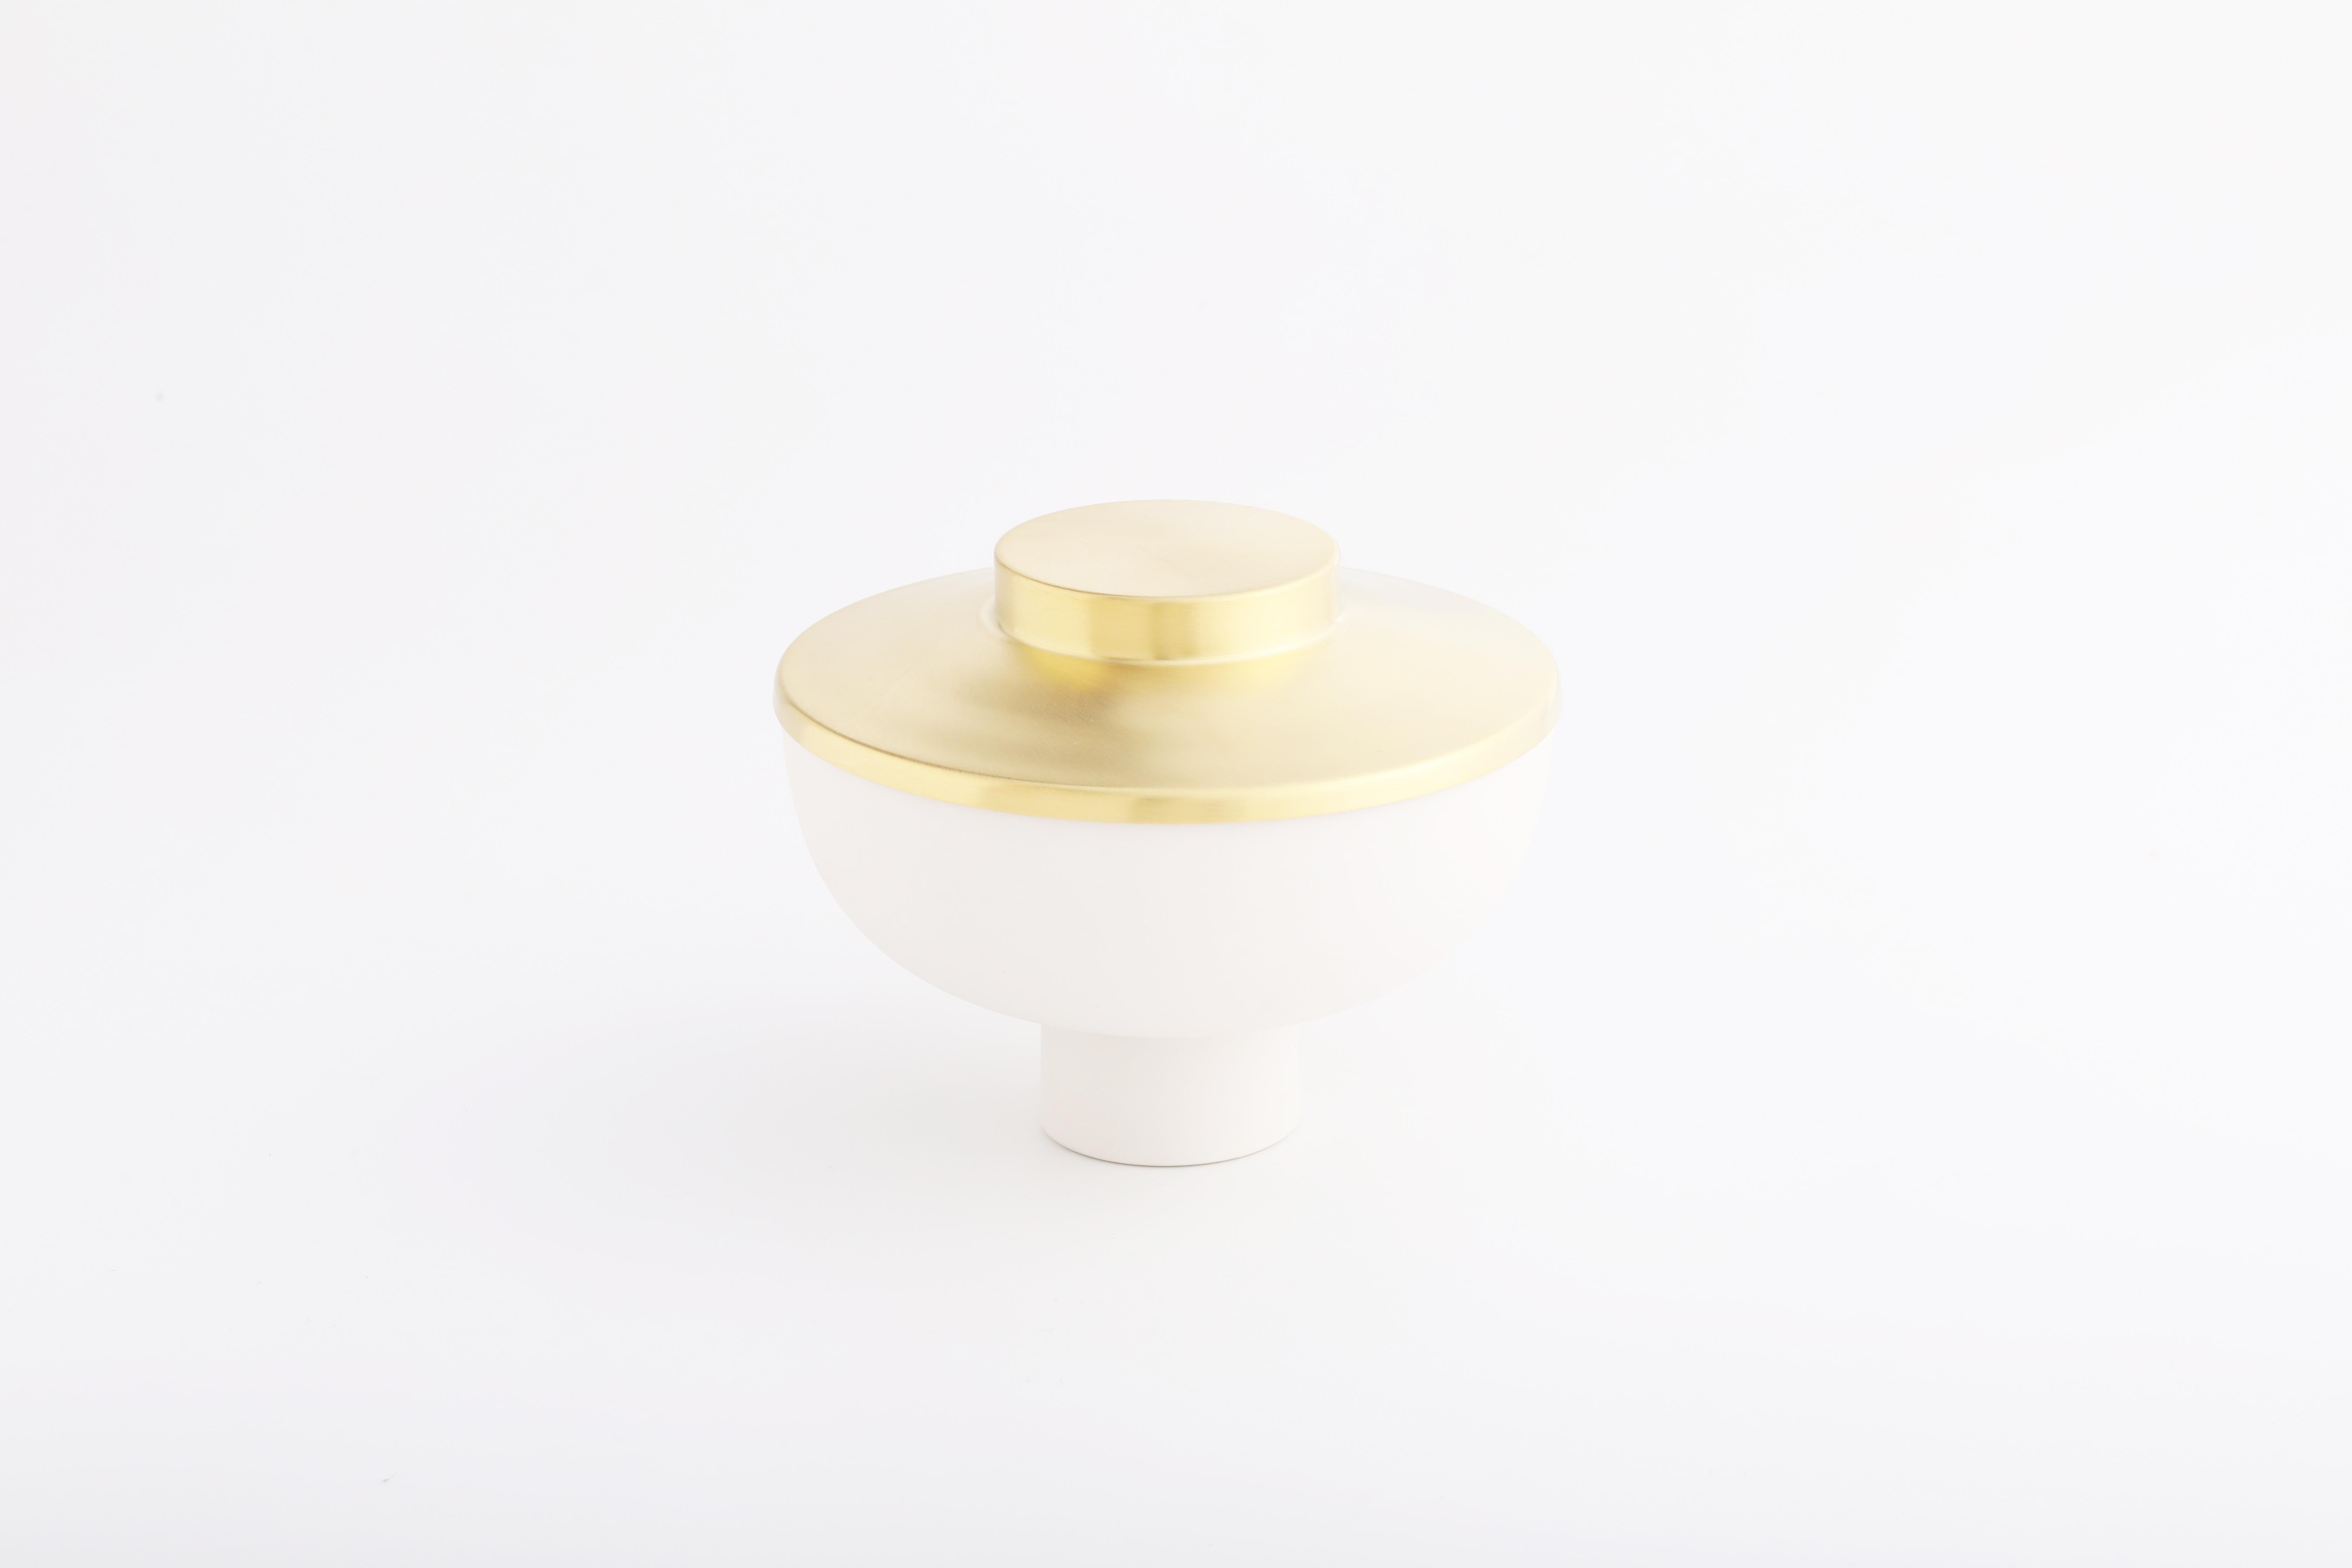 Set 1 (白瓷黃銅款 / White,Brass)